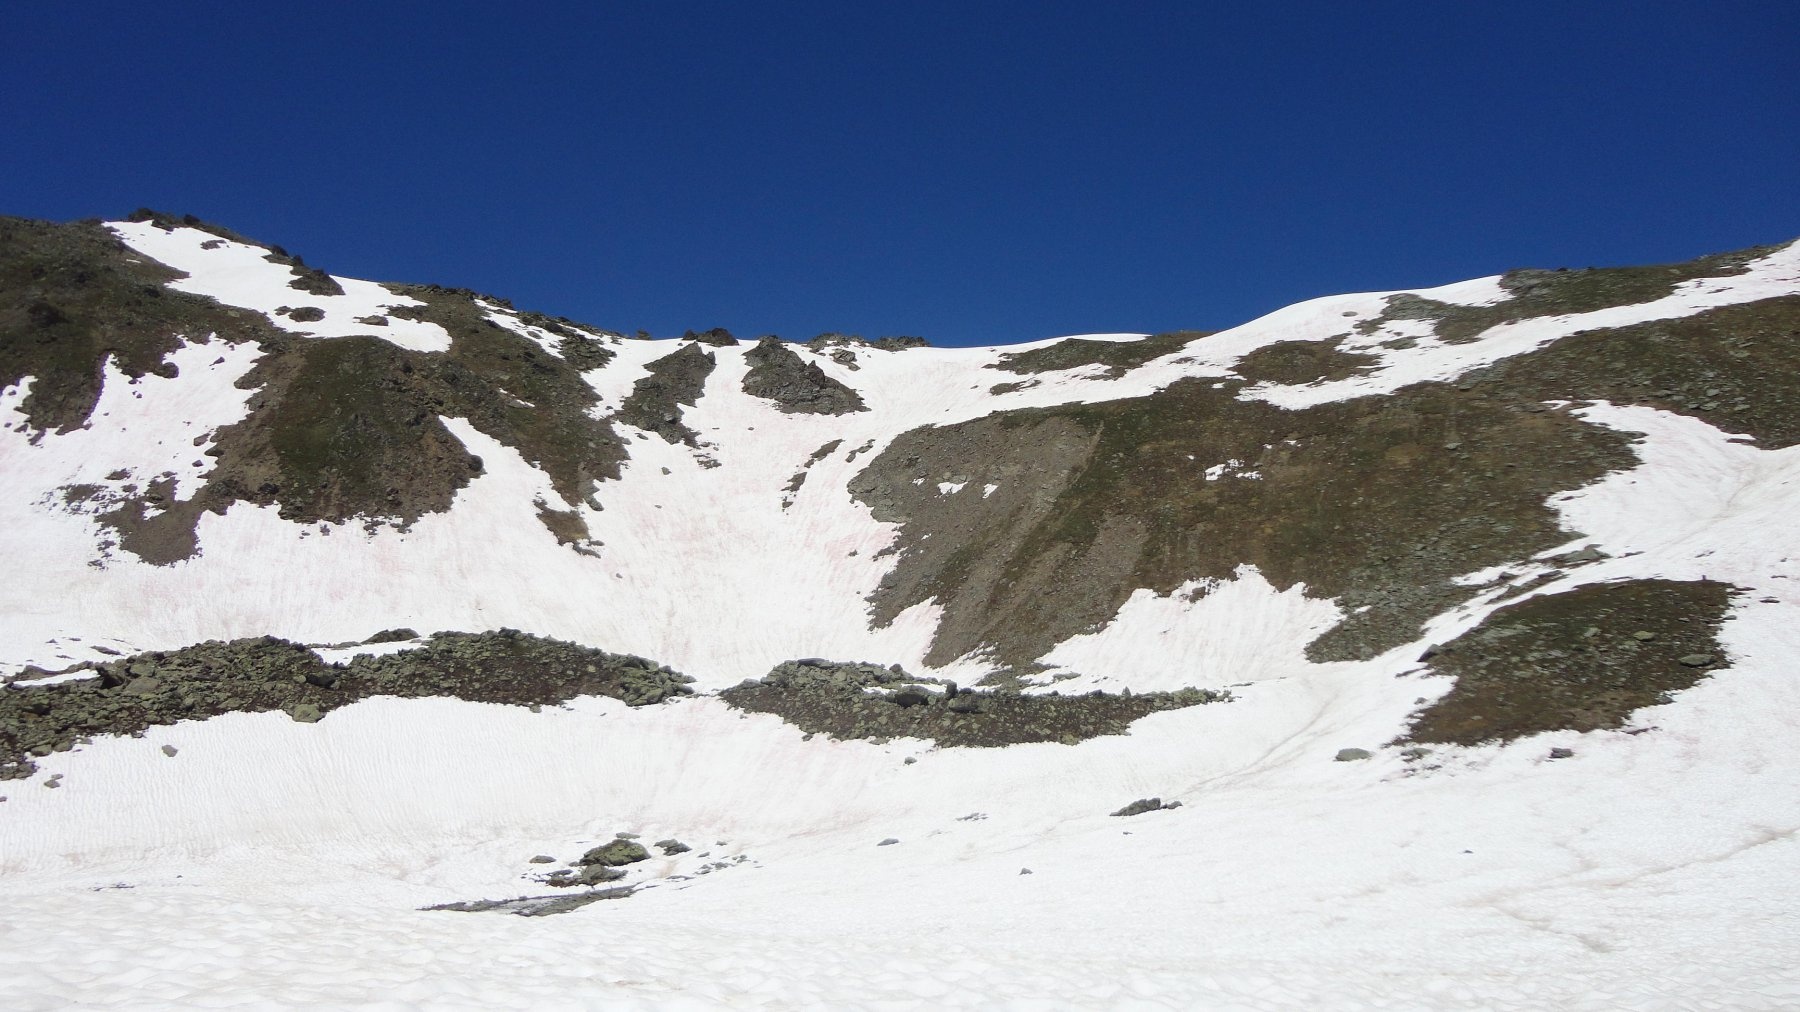 il colle e il mont vertosan